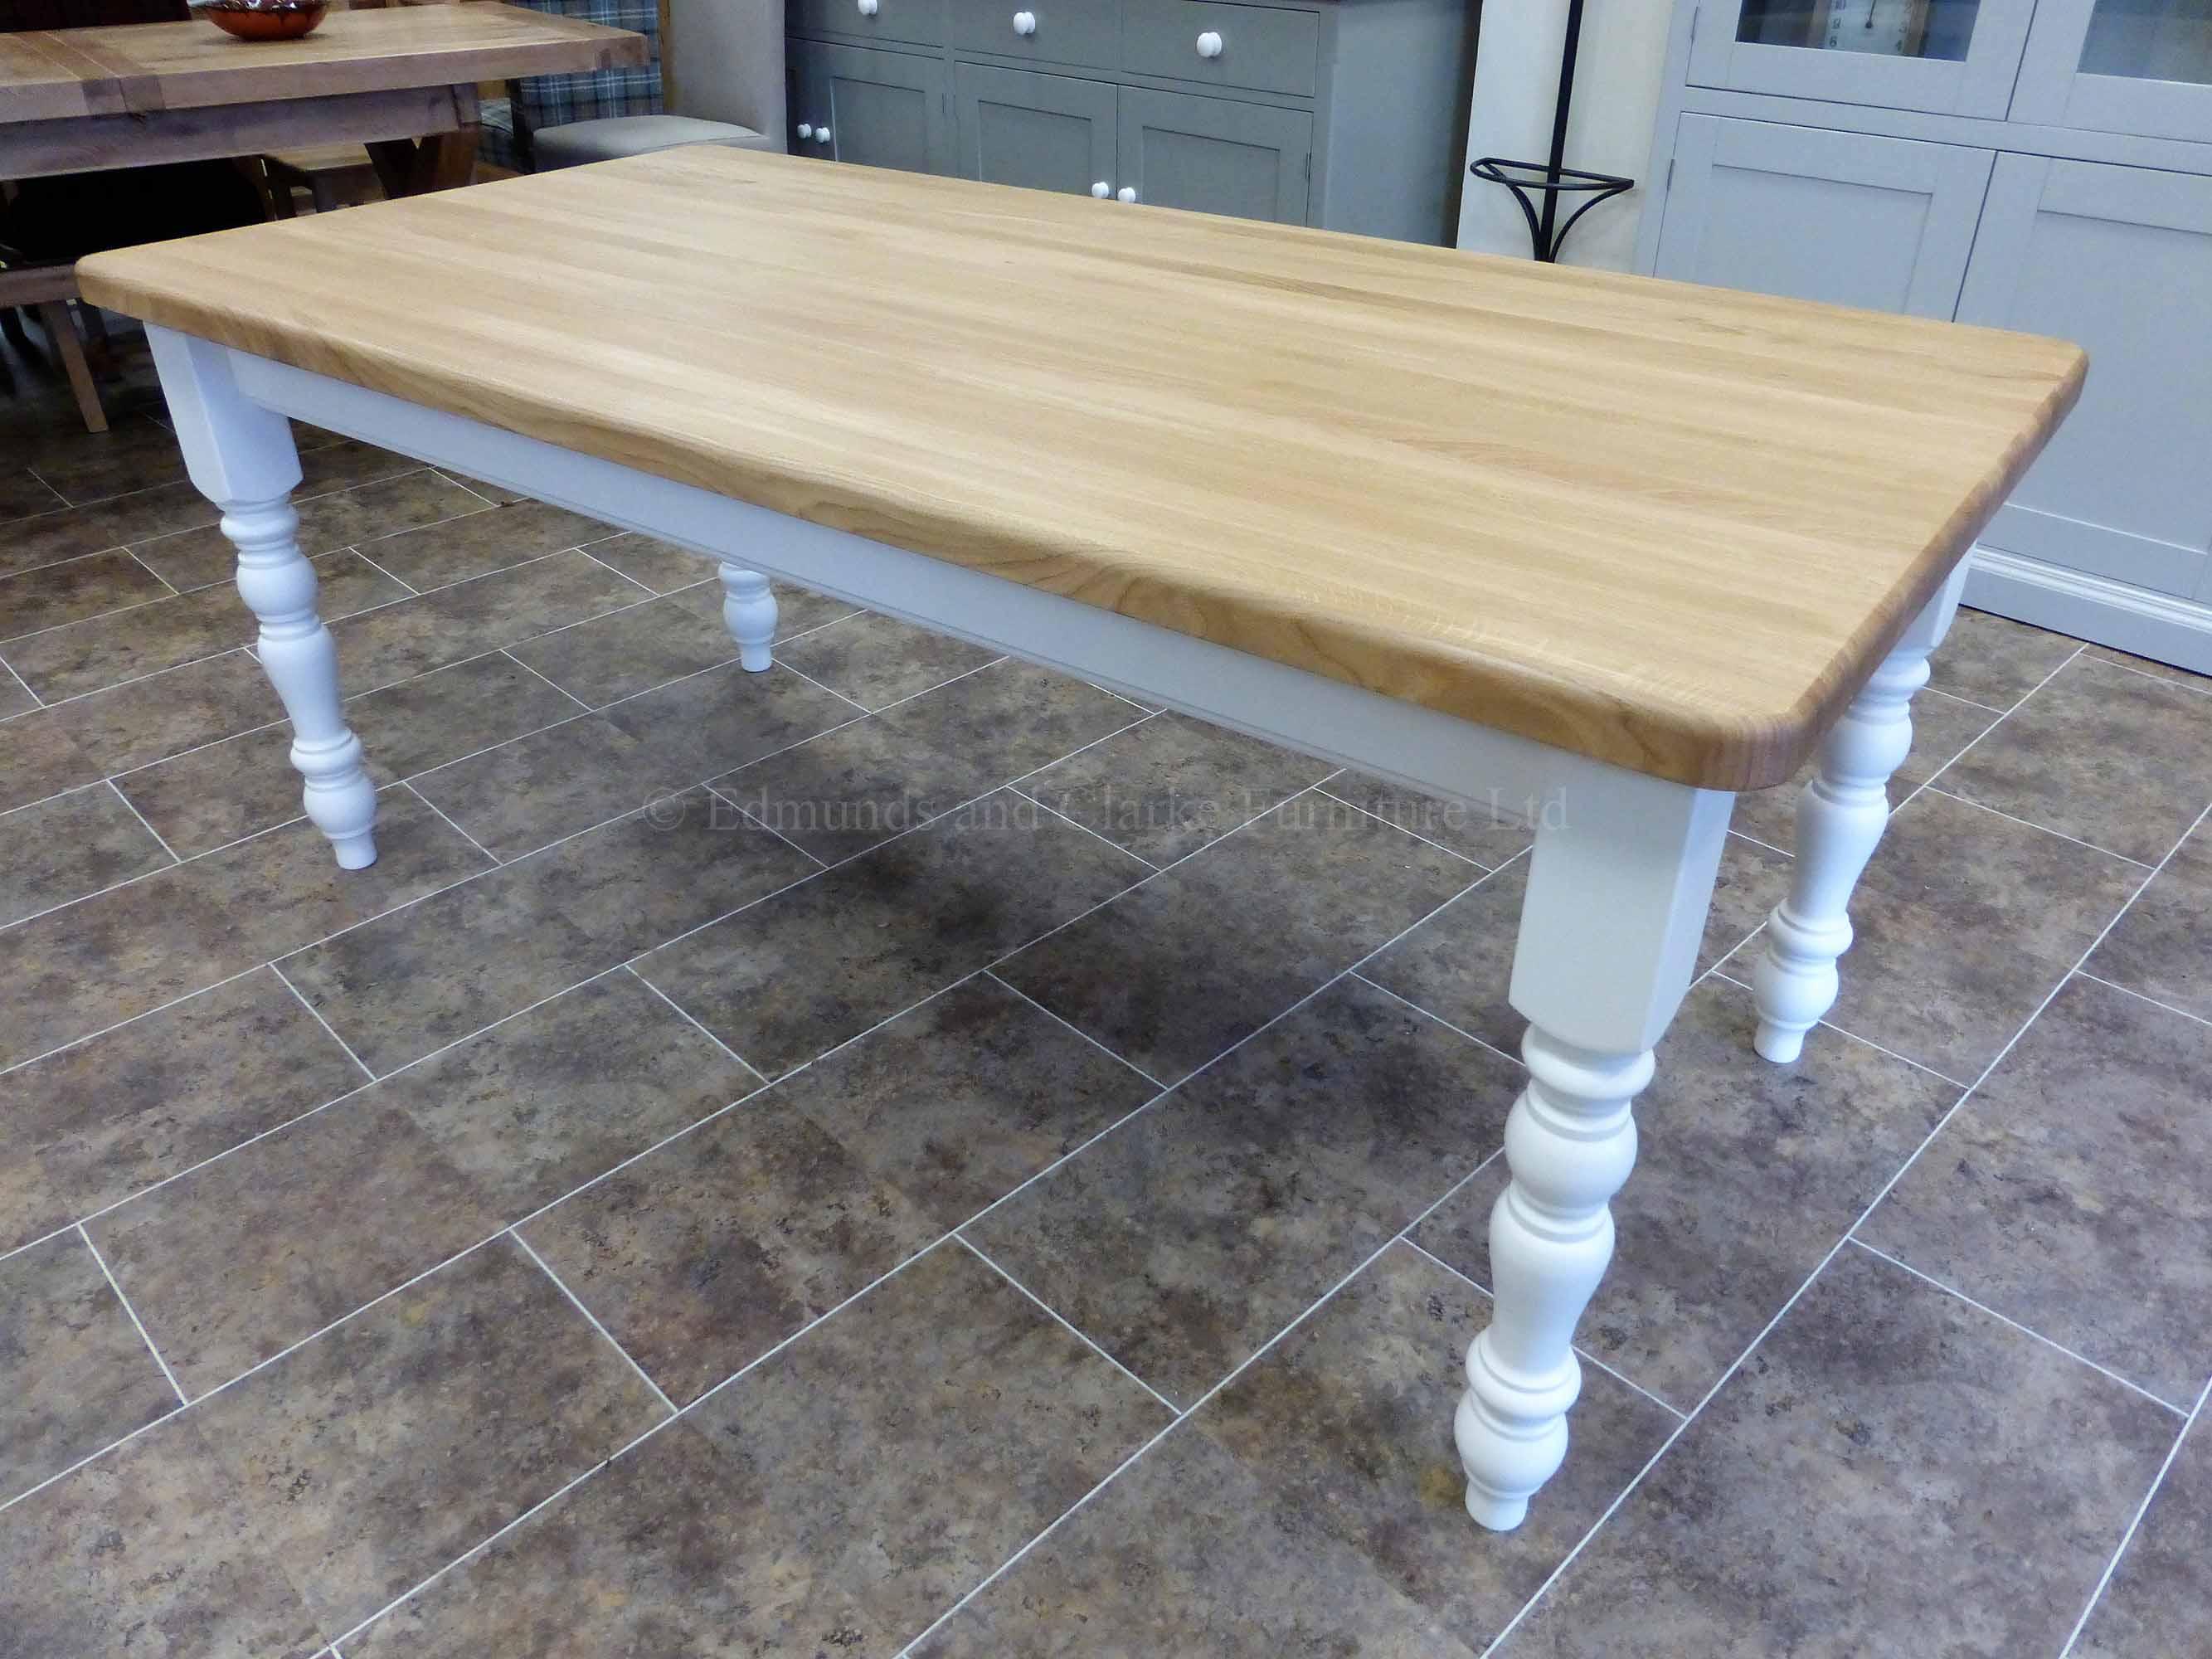 6' x 3' Farmhouse style table turned legs oak top